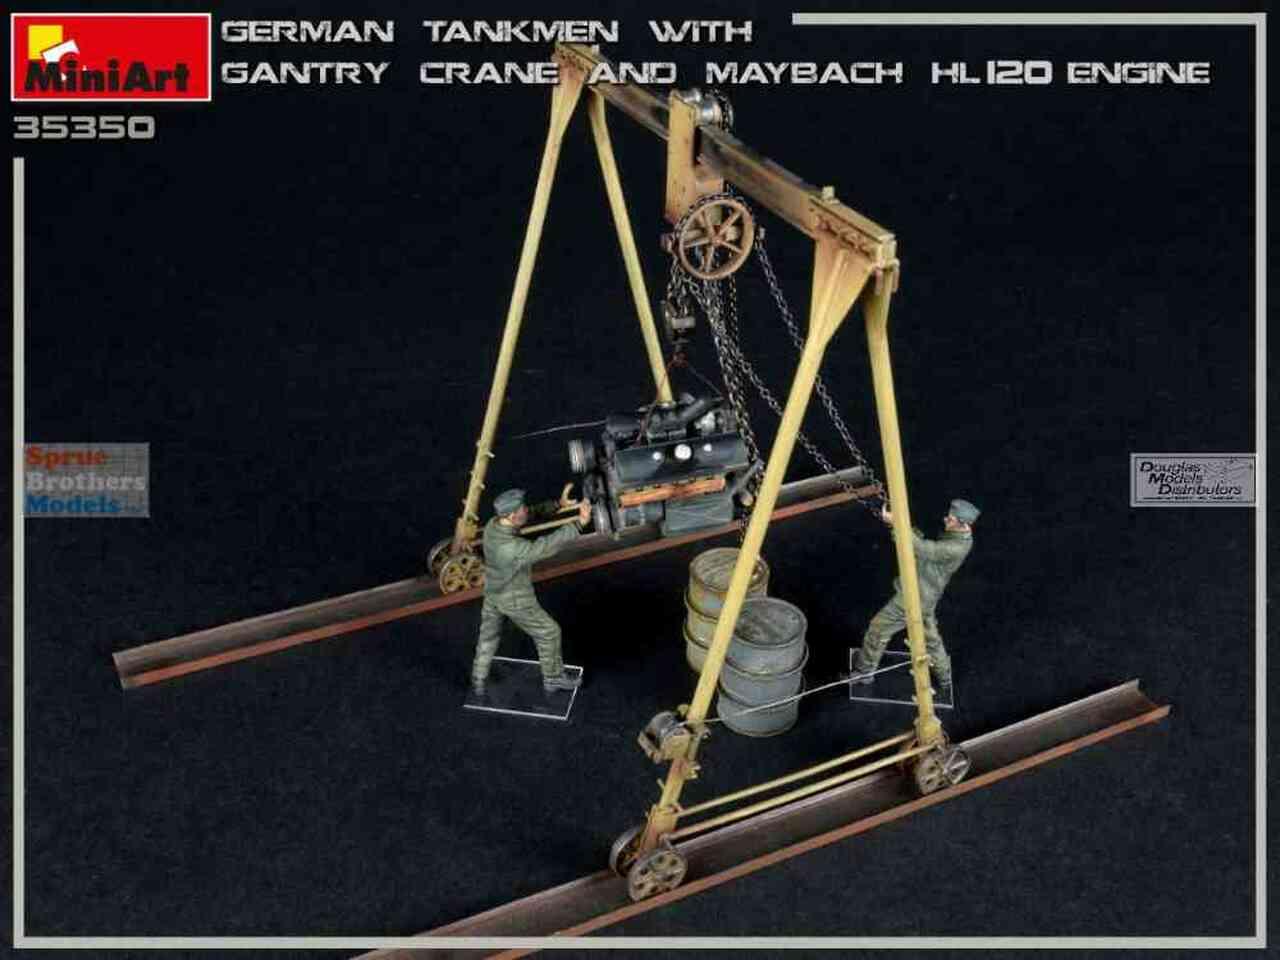 1/35 German Tankmen with Gantry Crane & Maybach HL